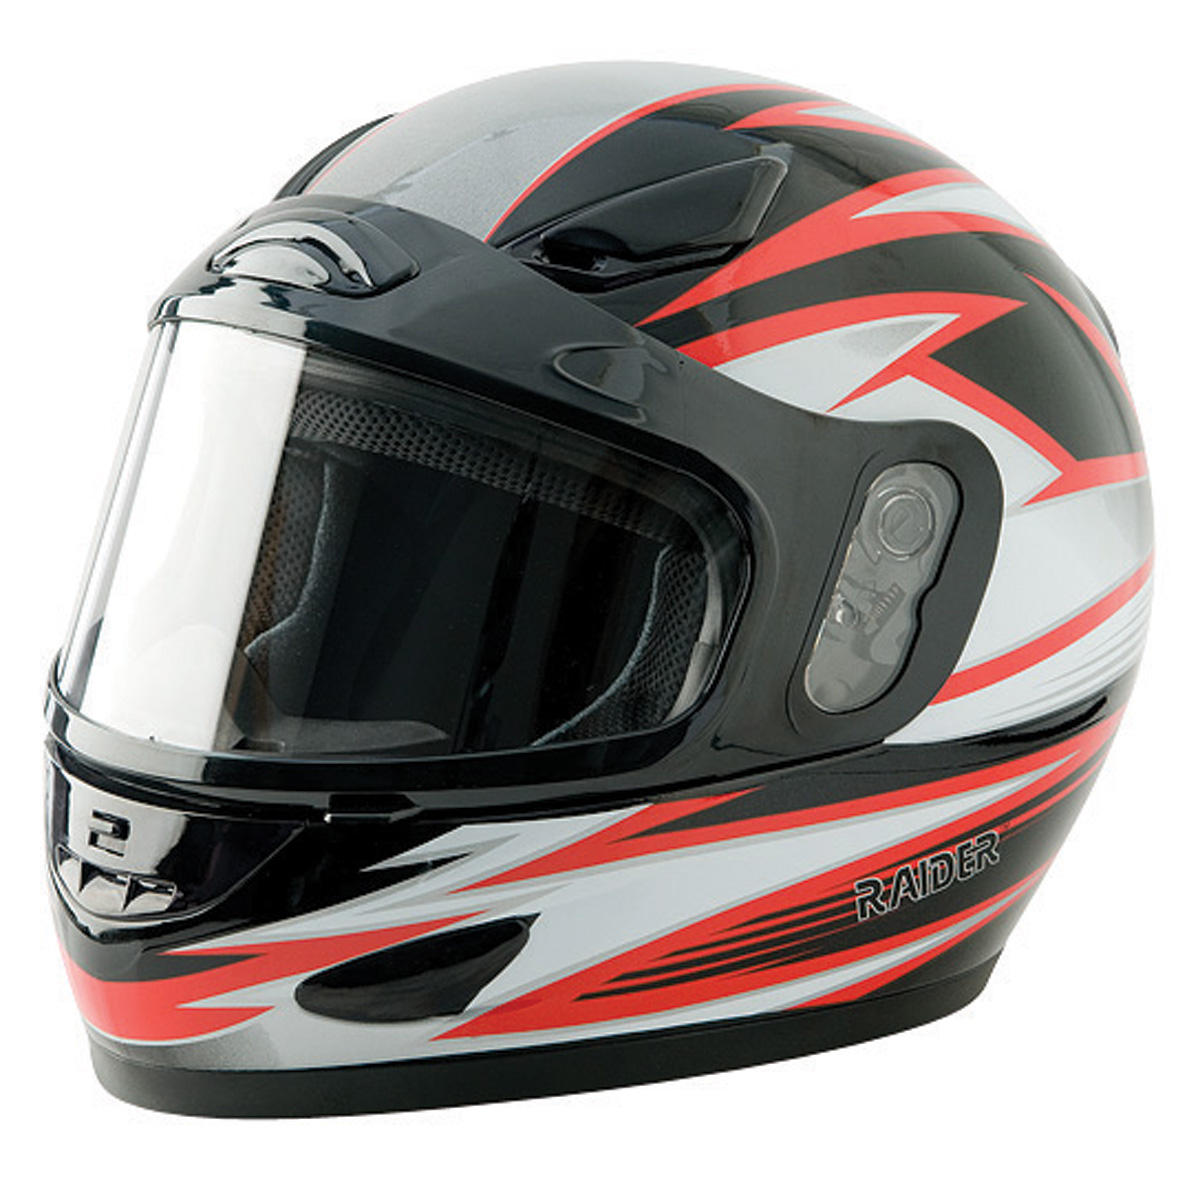 Raider Breath Deflector Fits Full Face Motorcycle Helmet